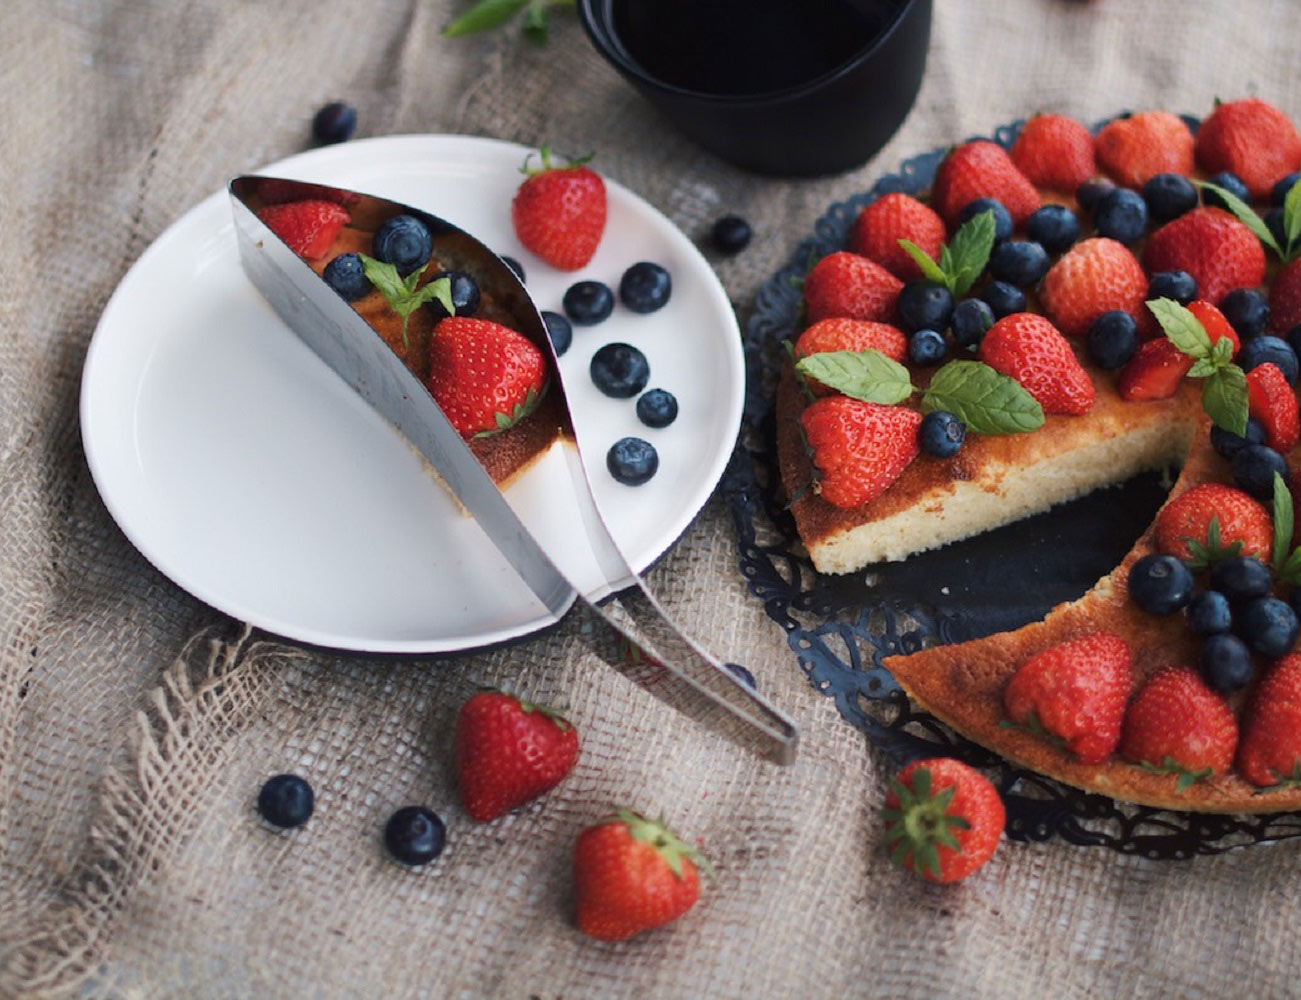 Cake Server by Magisso